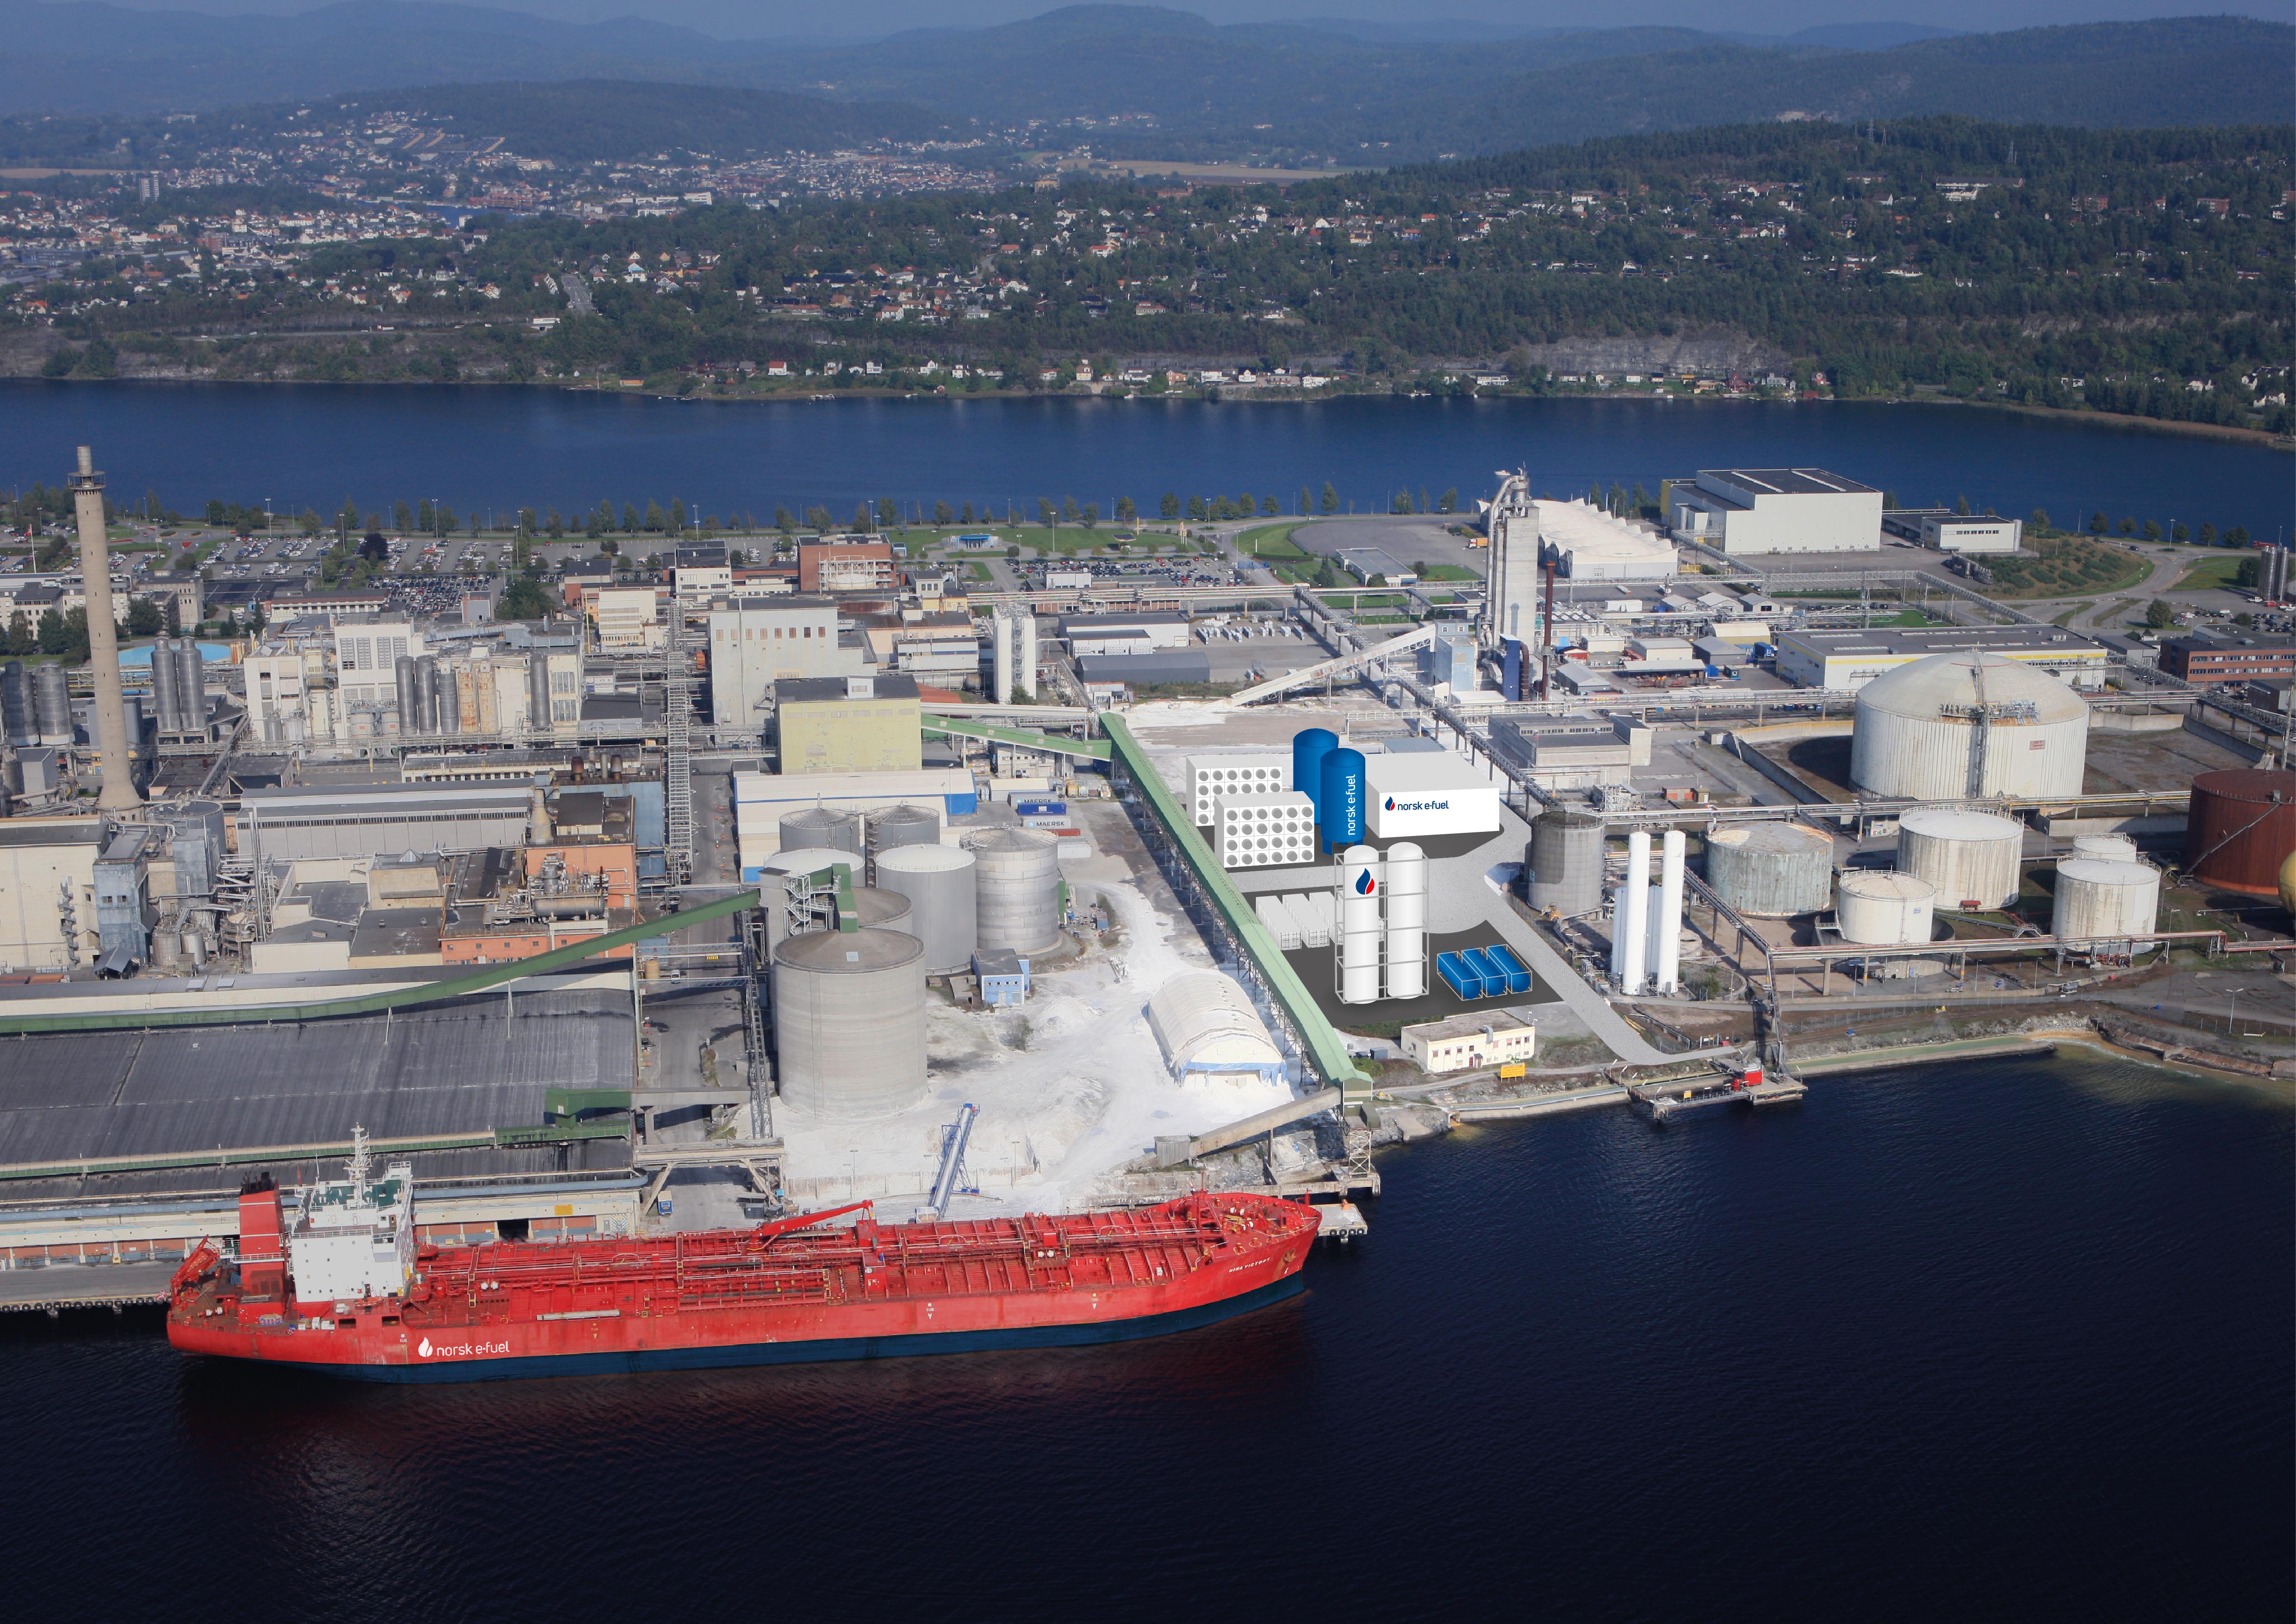 Skal produsere bærekraftig hydrogenbasert flydrivstoff i Norge